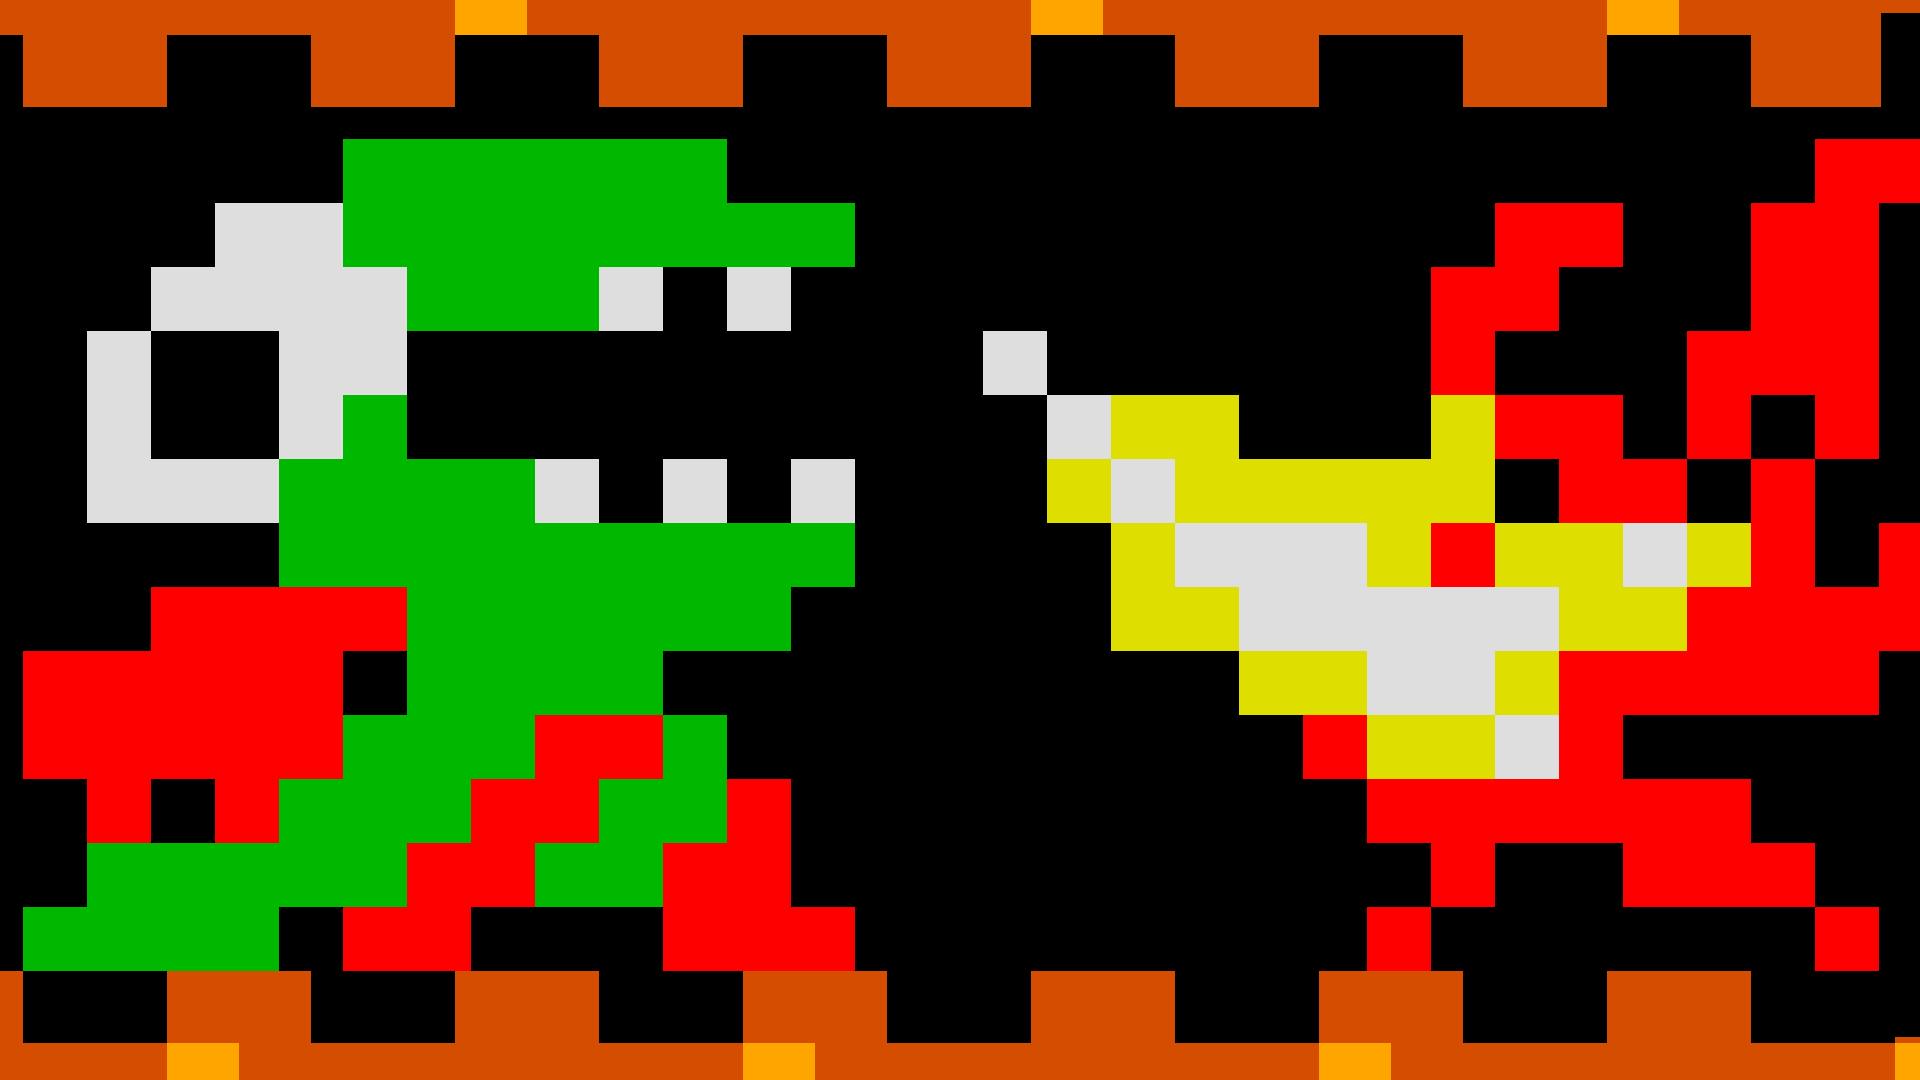 Xbox Arcade Game Series Dig Dug Achievements Find Your Xbox